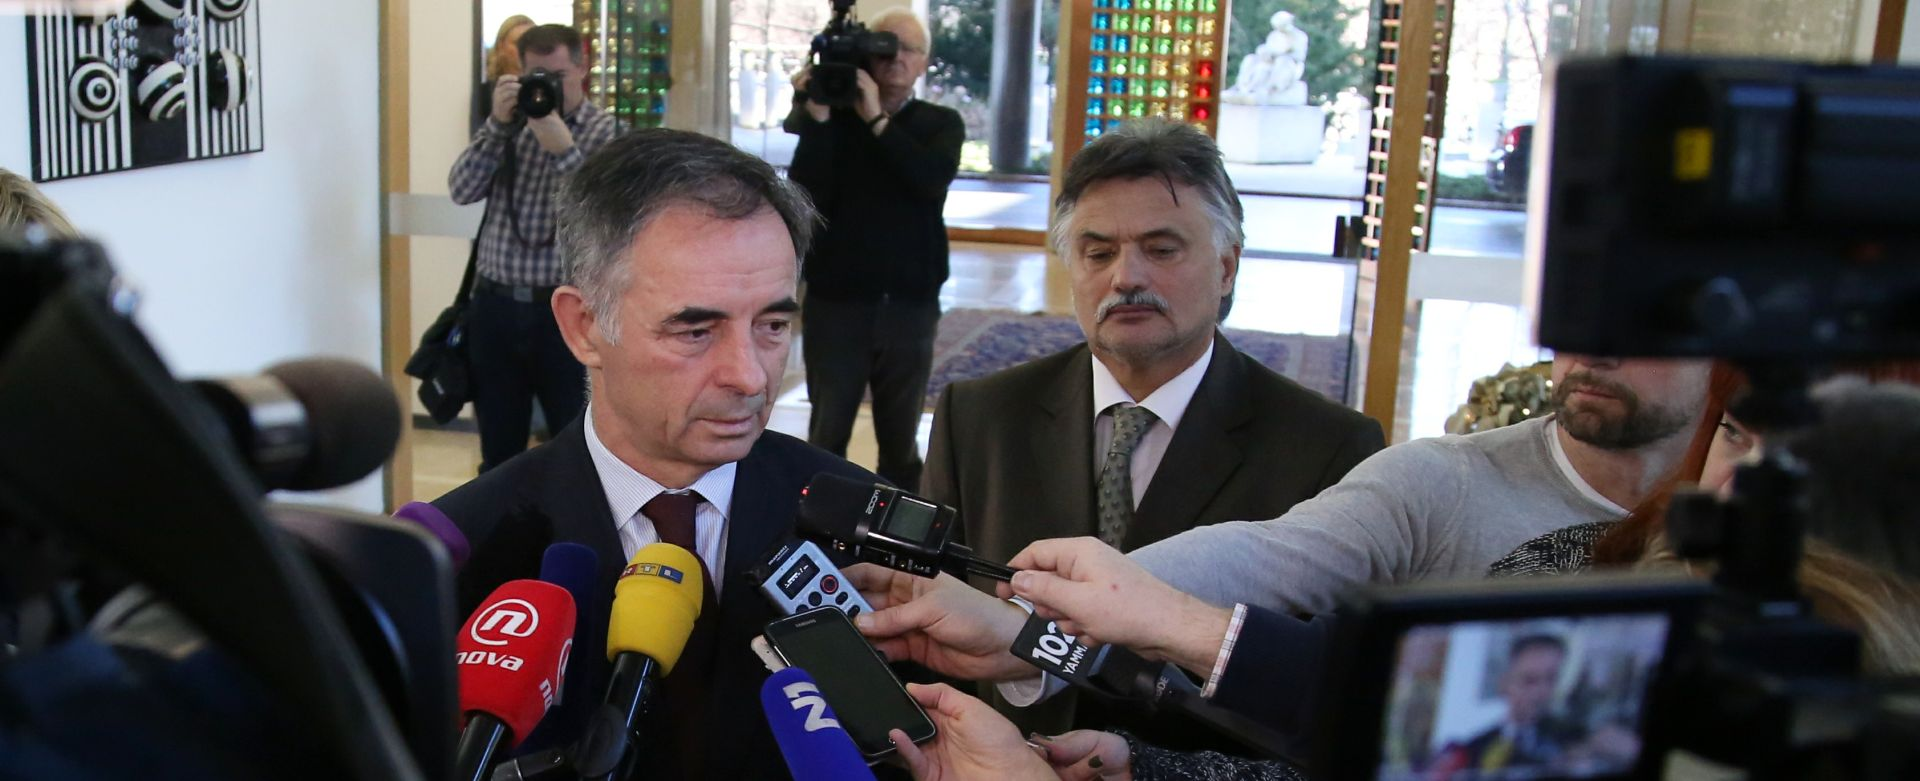 NITKO NEMA DOVOLJNO POTPISA: Na Pantovčaku počeo četvrti krug konzultacija o mandataru